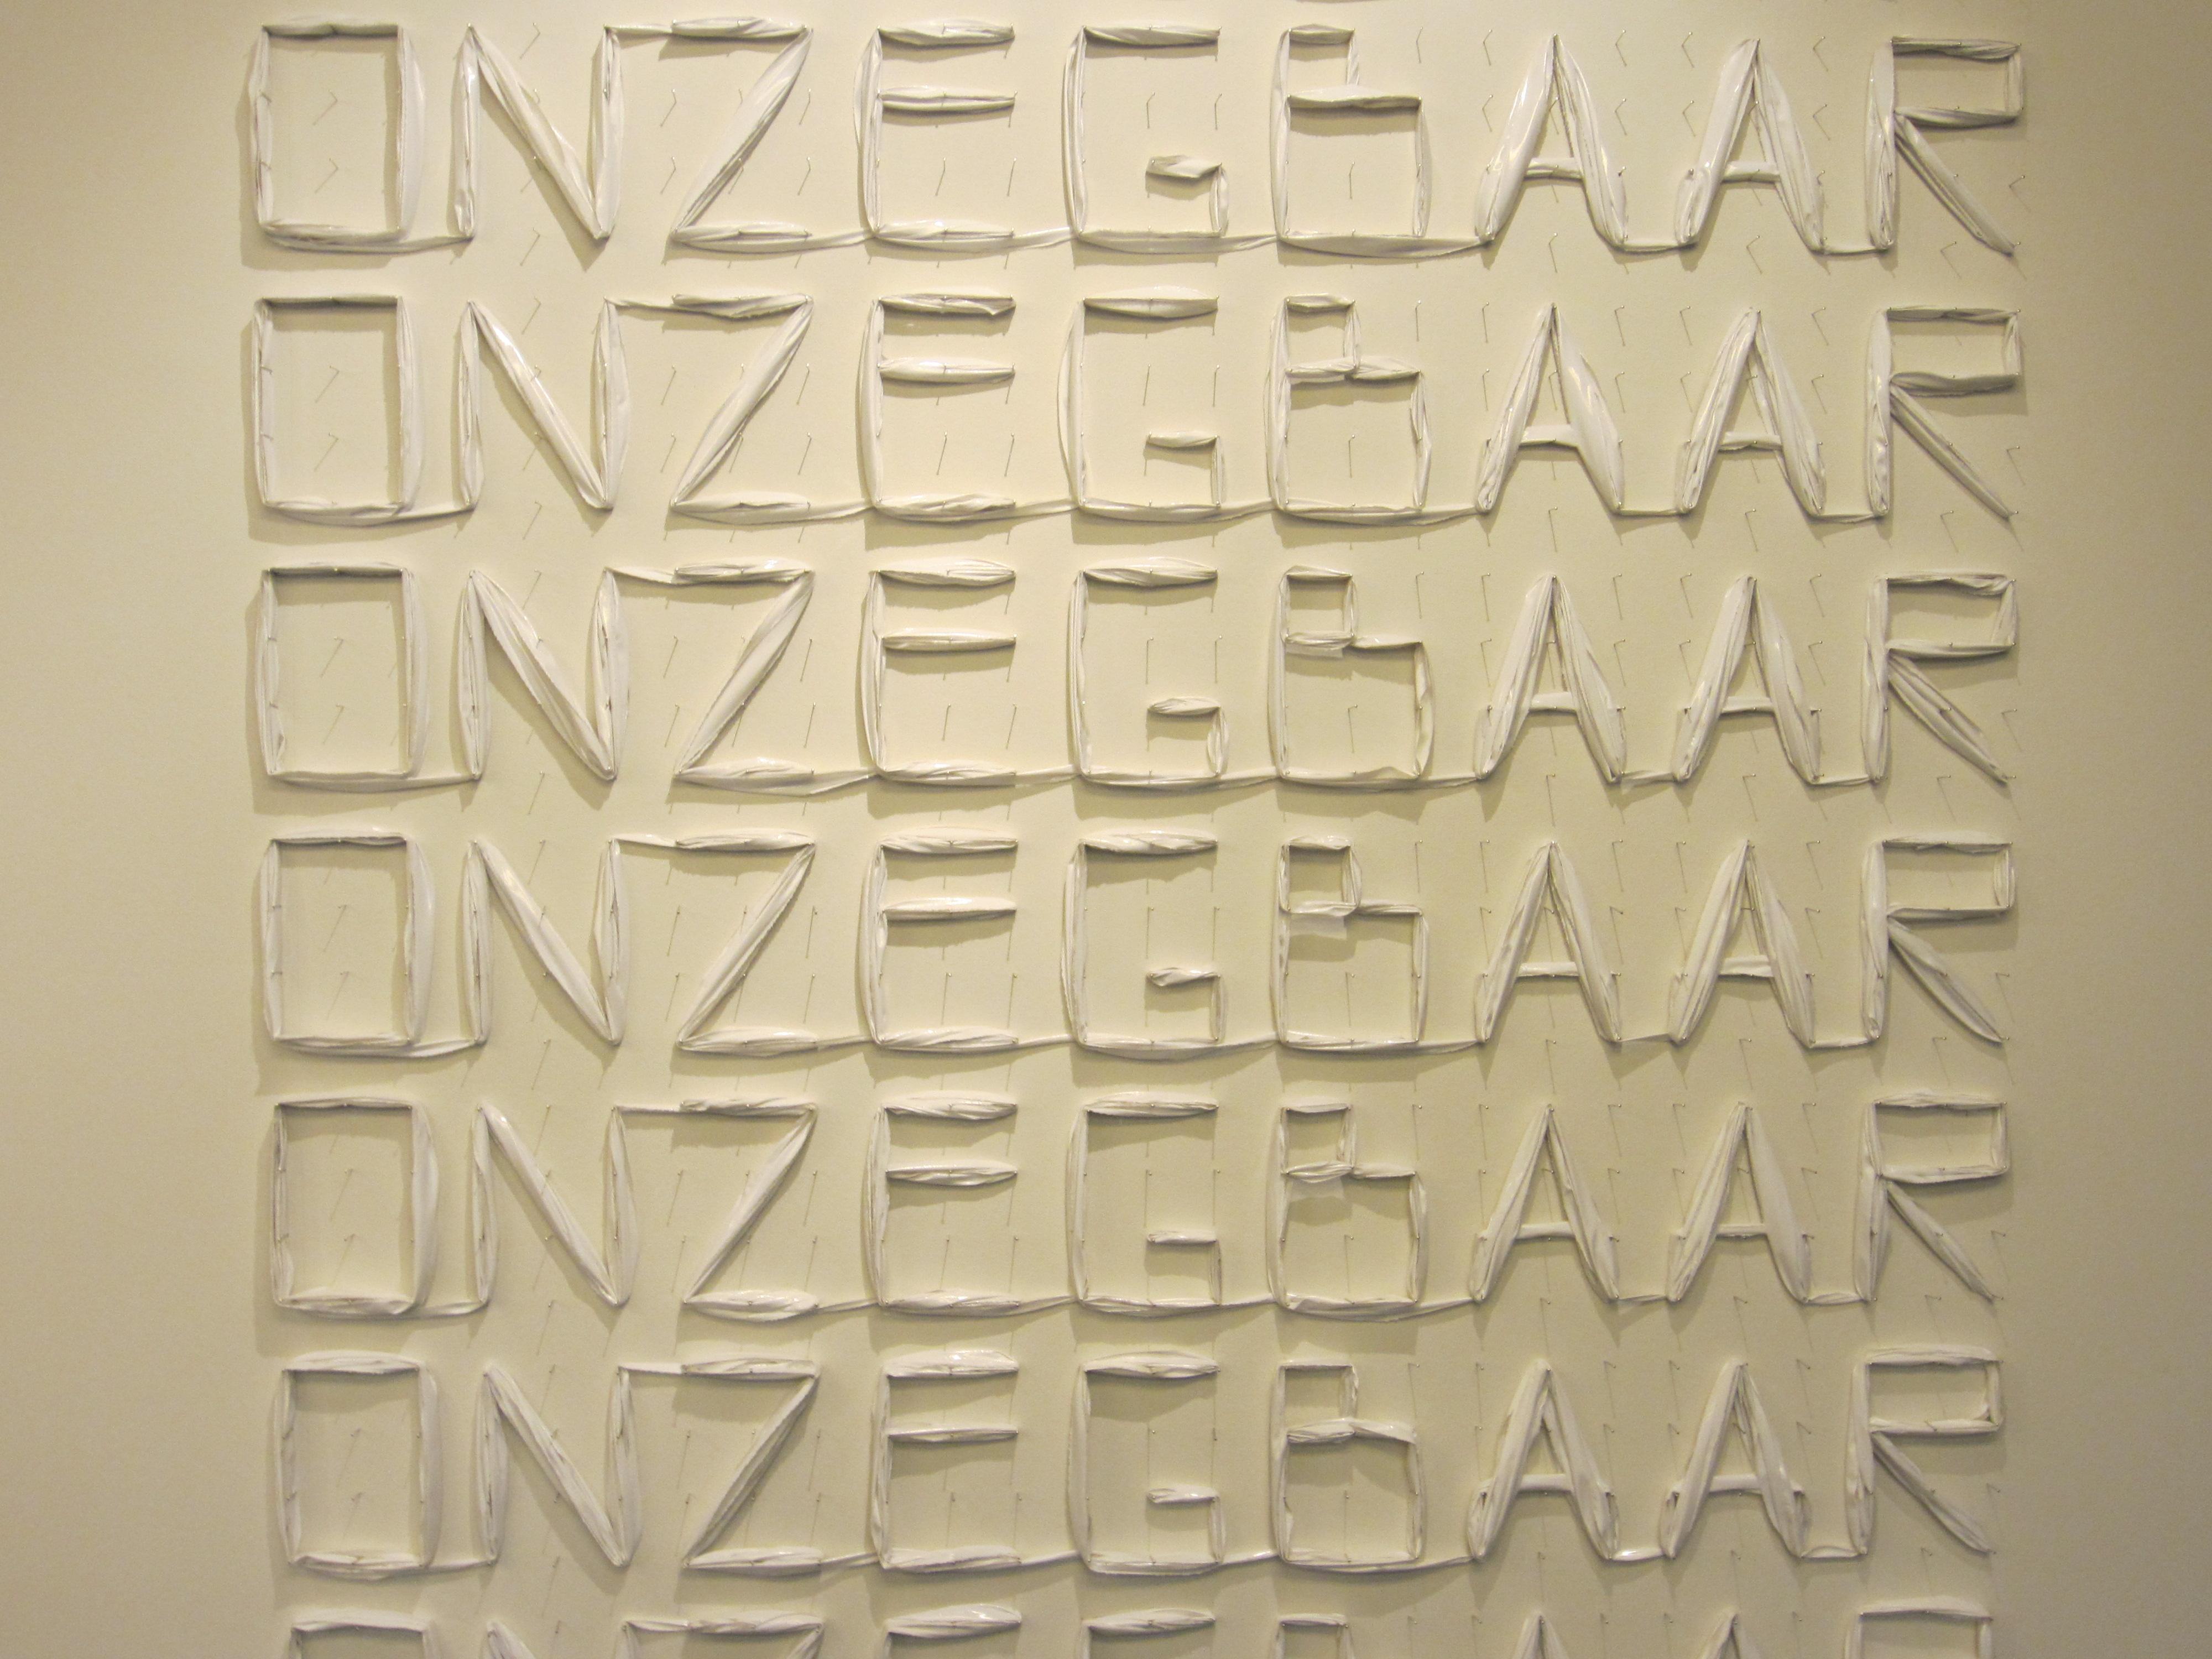 Lam de Wolf, 3 februari 2012, wandobject, kunststof